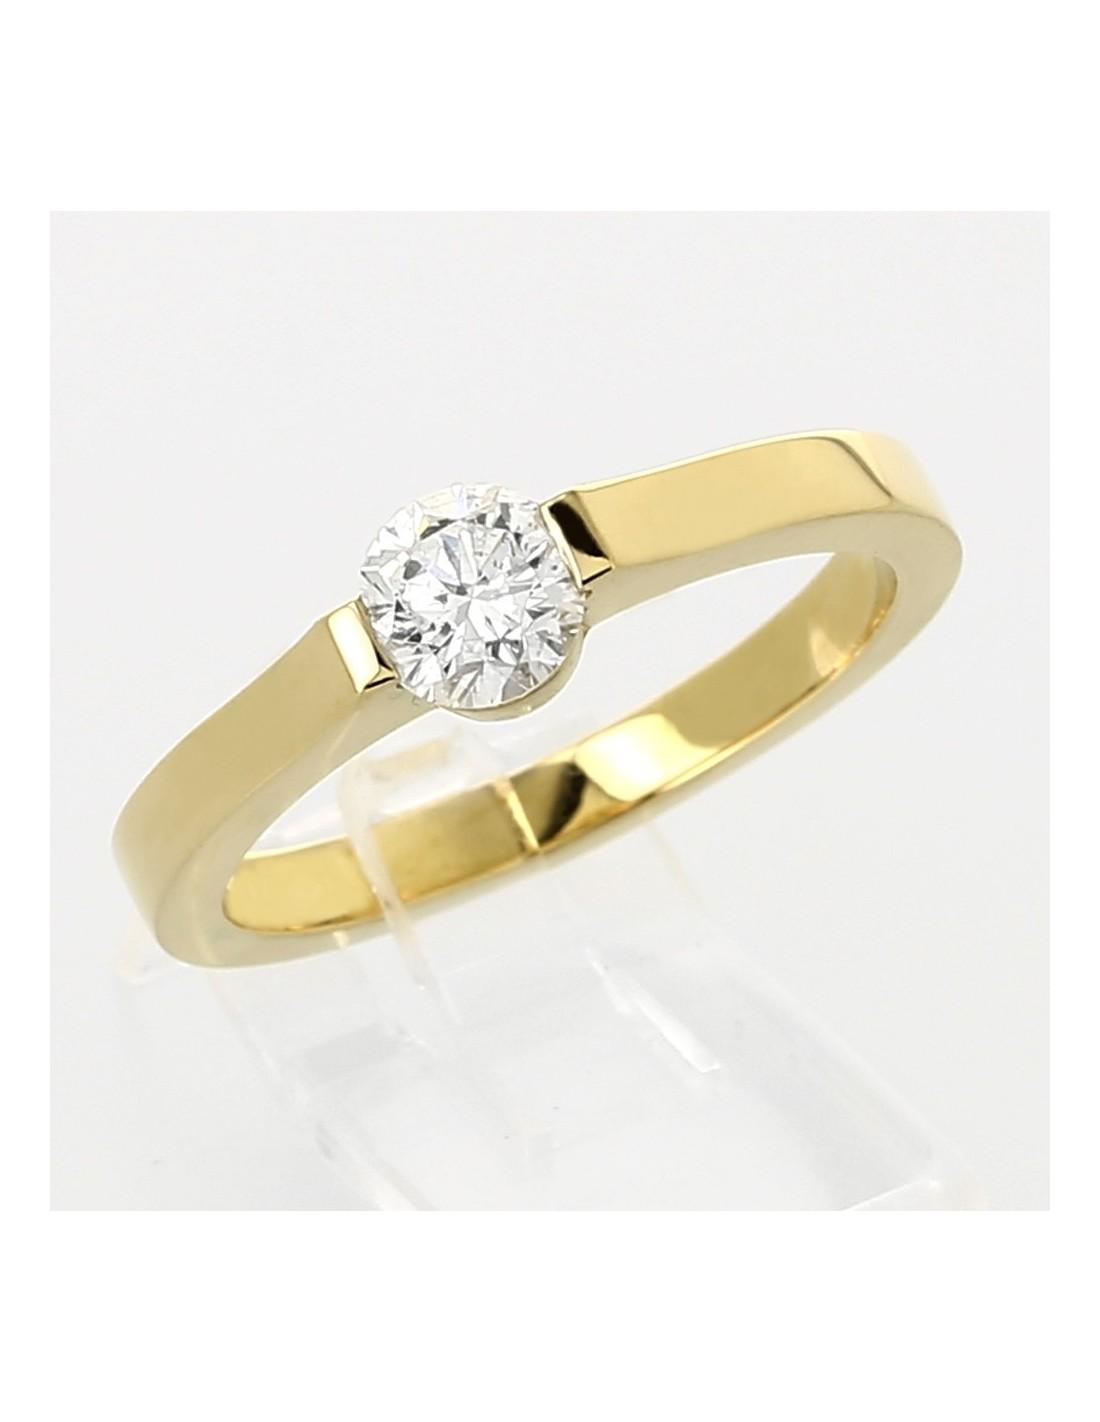 Bien connu Solitaire moderne e or 18 carats serti demi-clos diamant 0,54 carat AC94